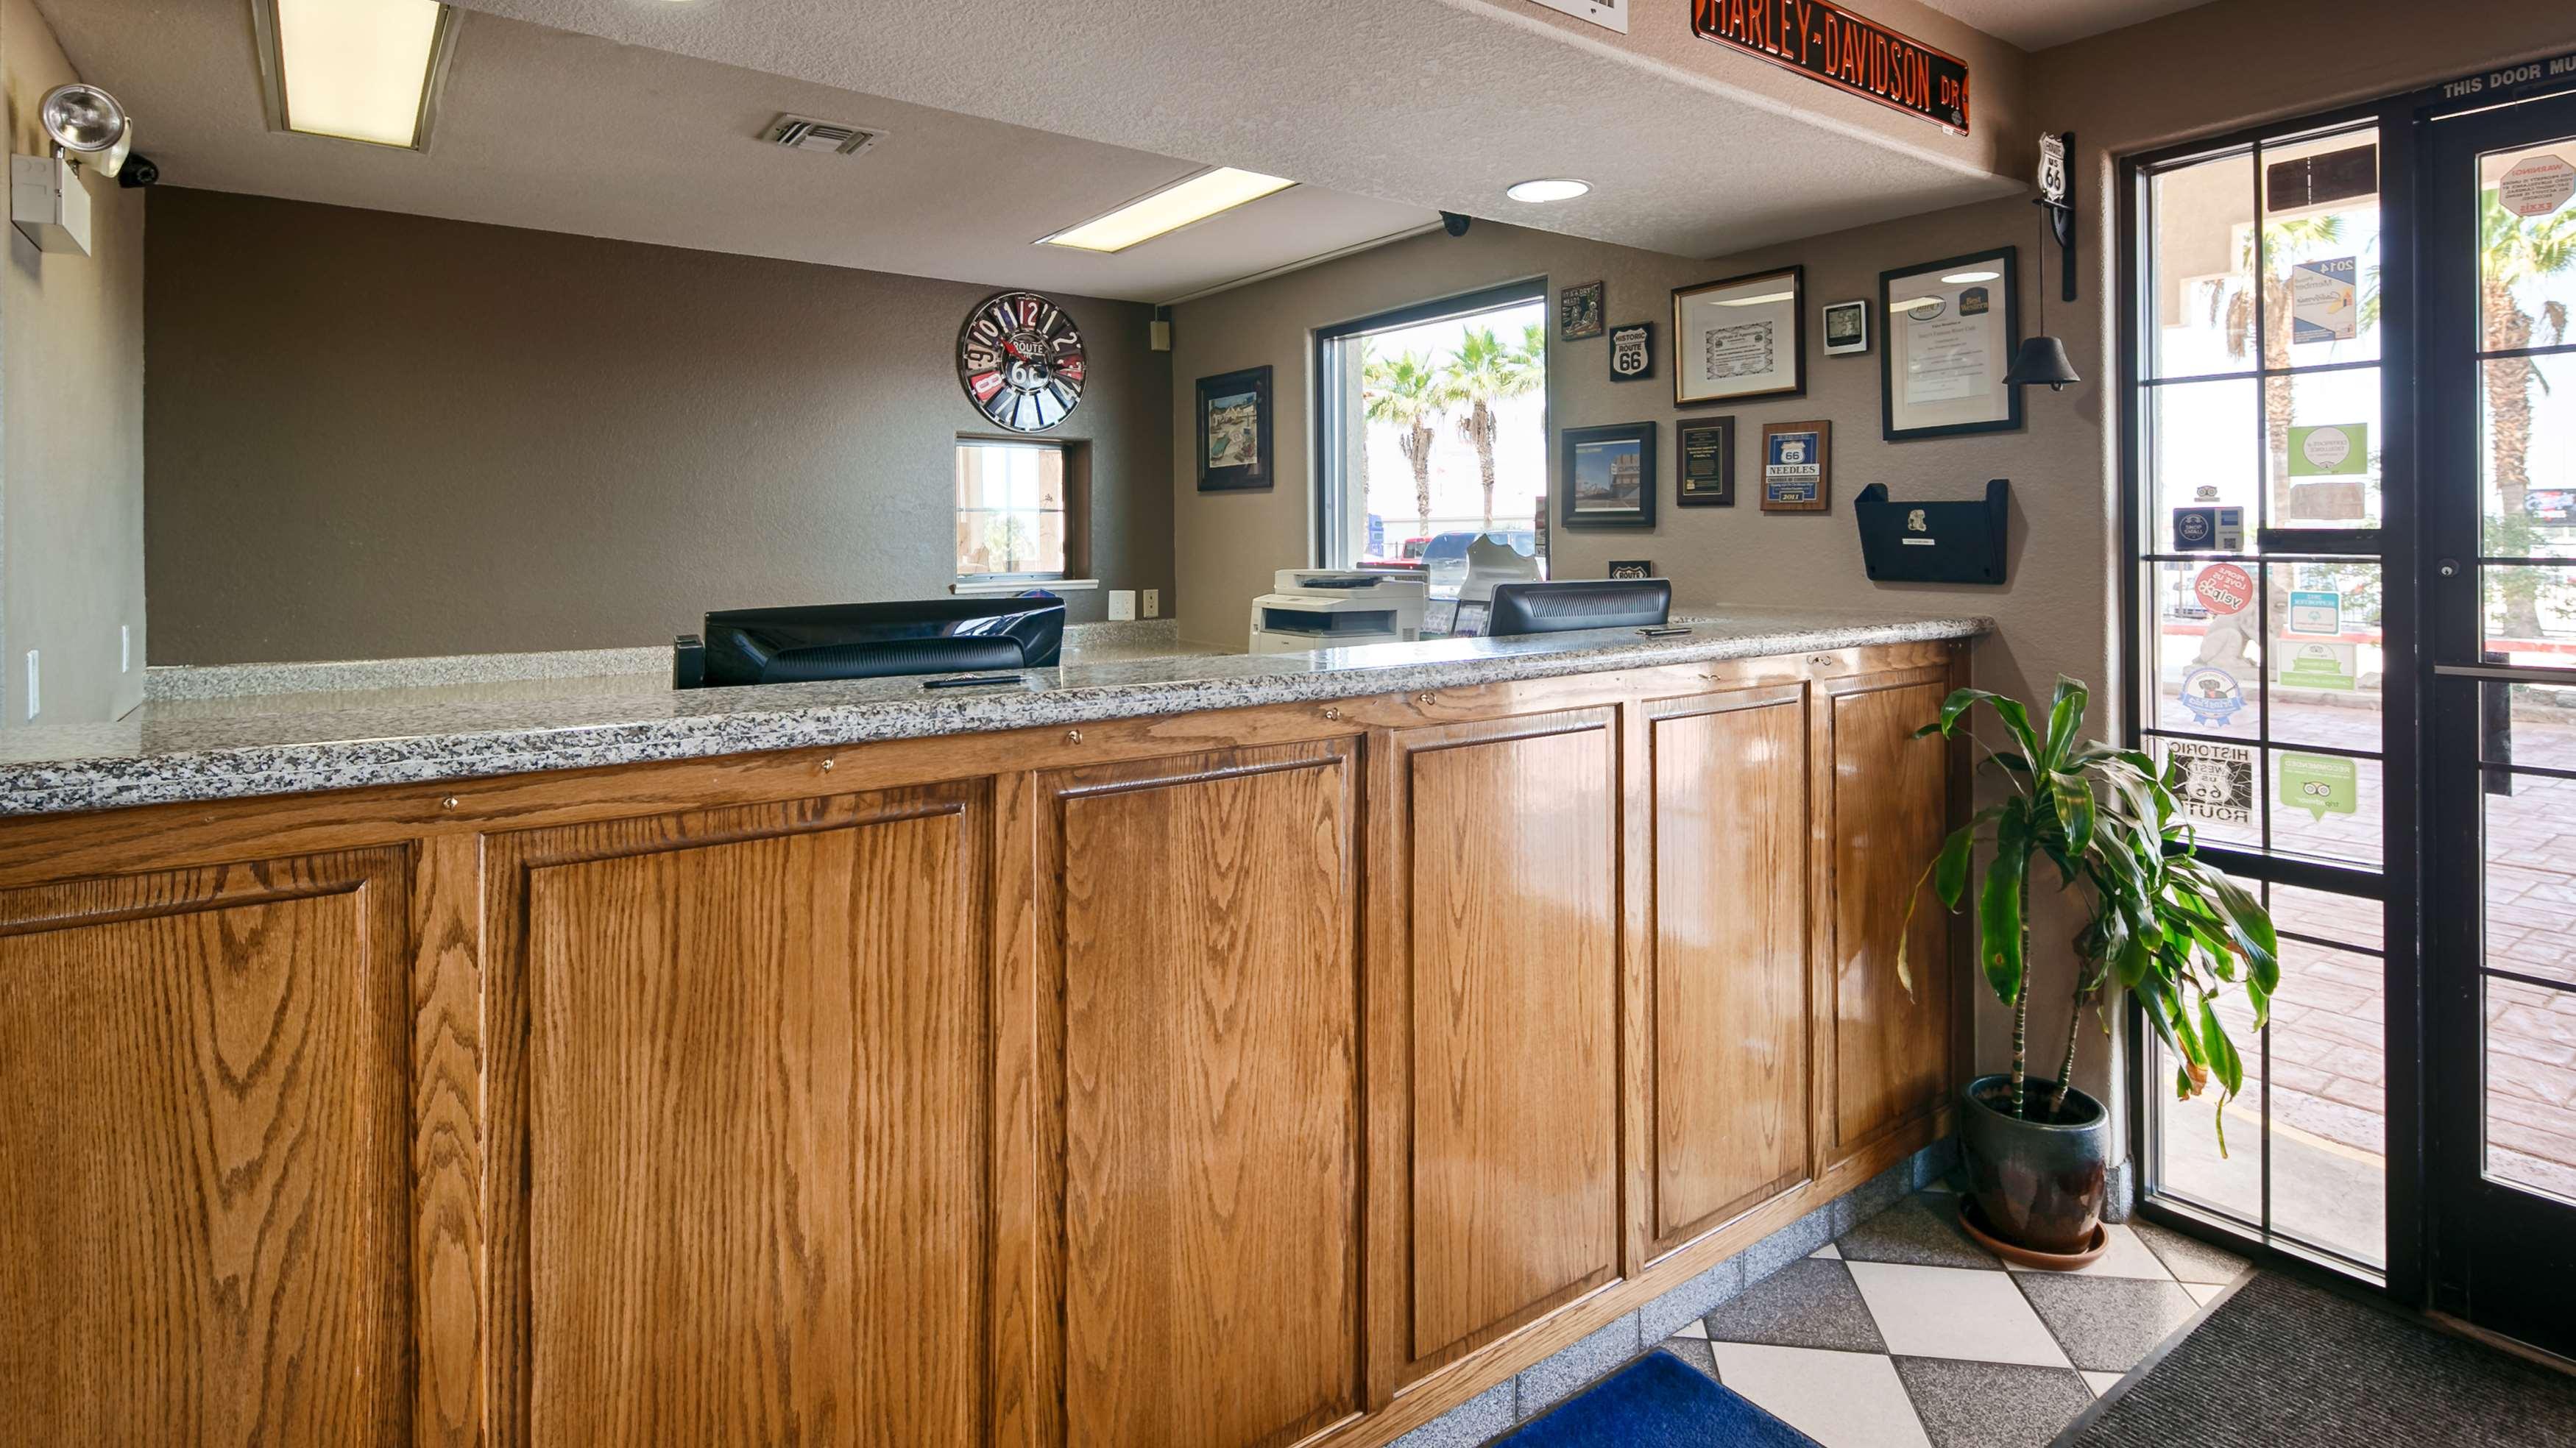 Best Western Colorado River Inn image 2